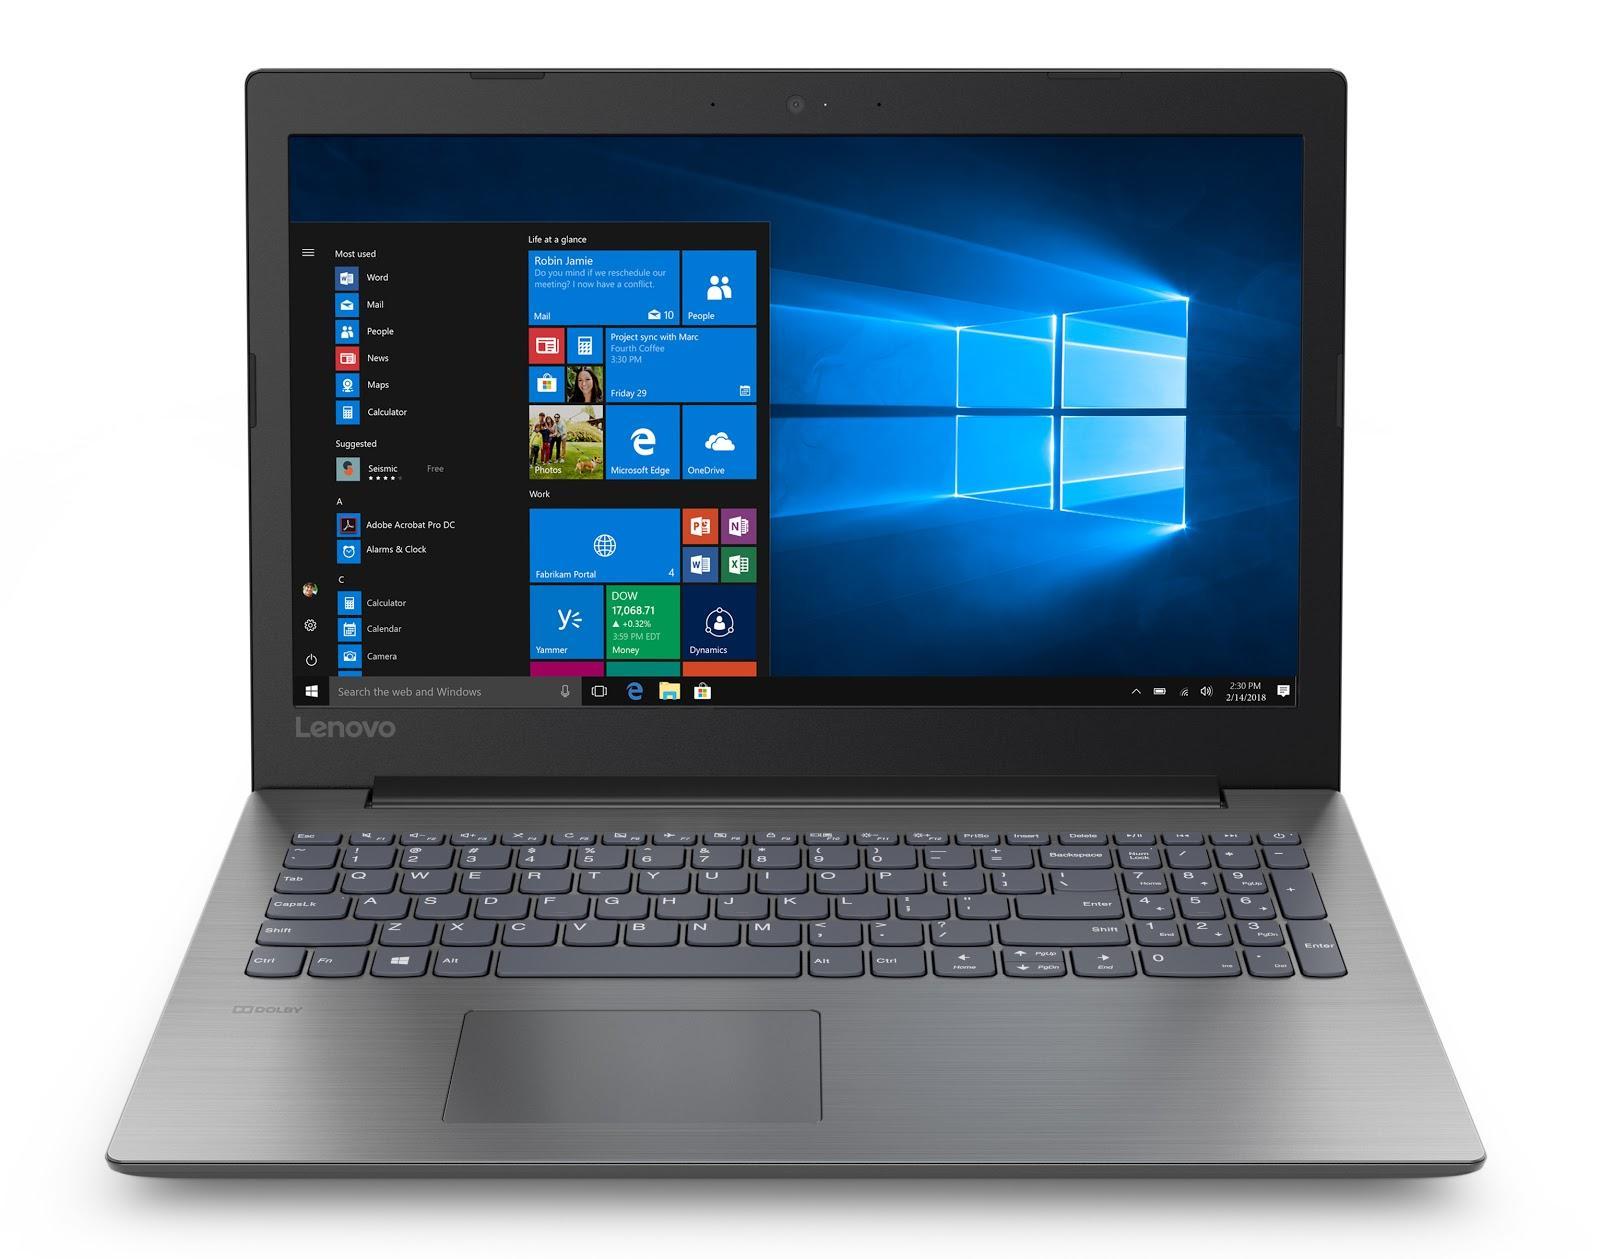 Фото 4. Ноутбук Lenovo ideapad 330-15 Onyx Black (81DE01VPRA)